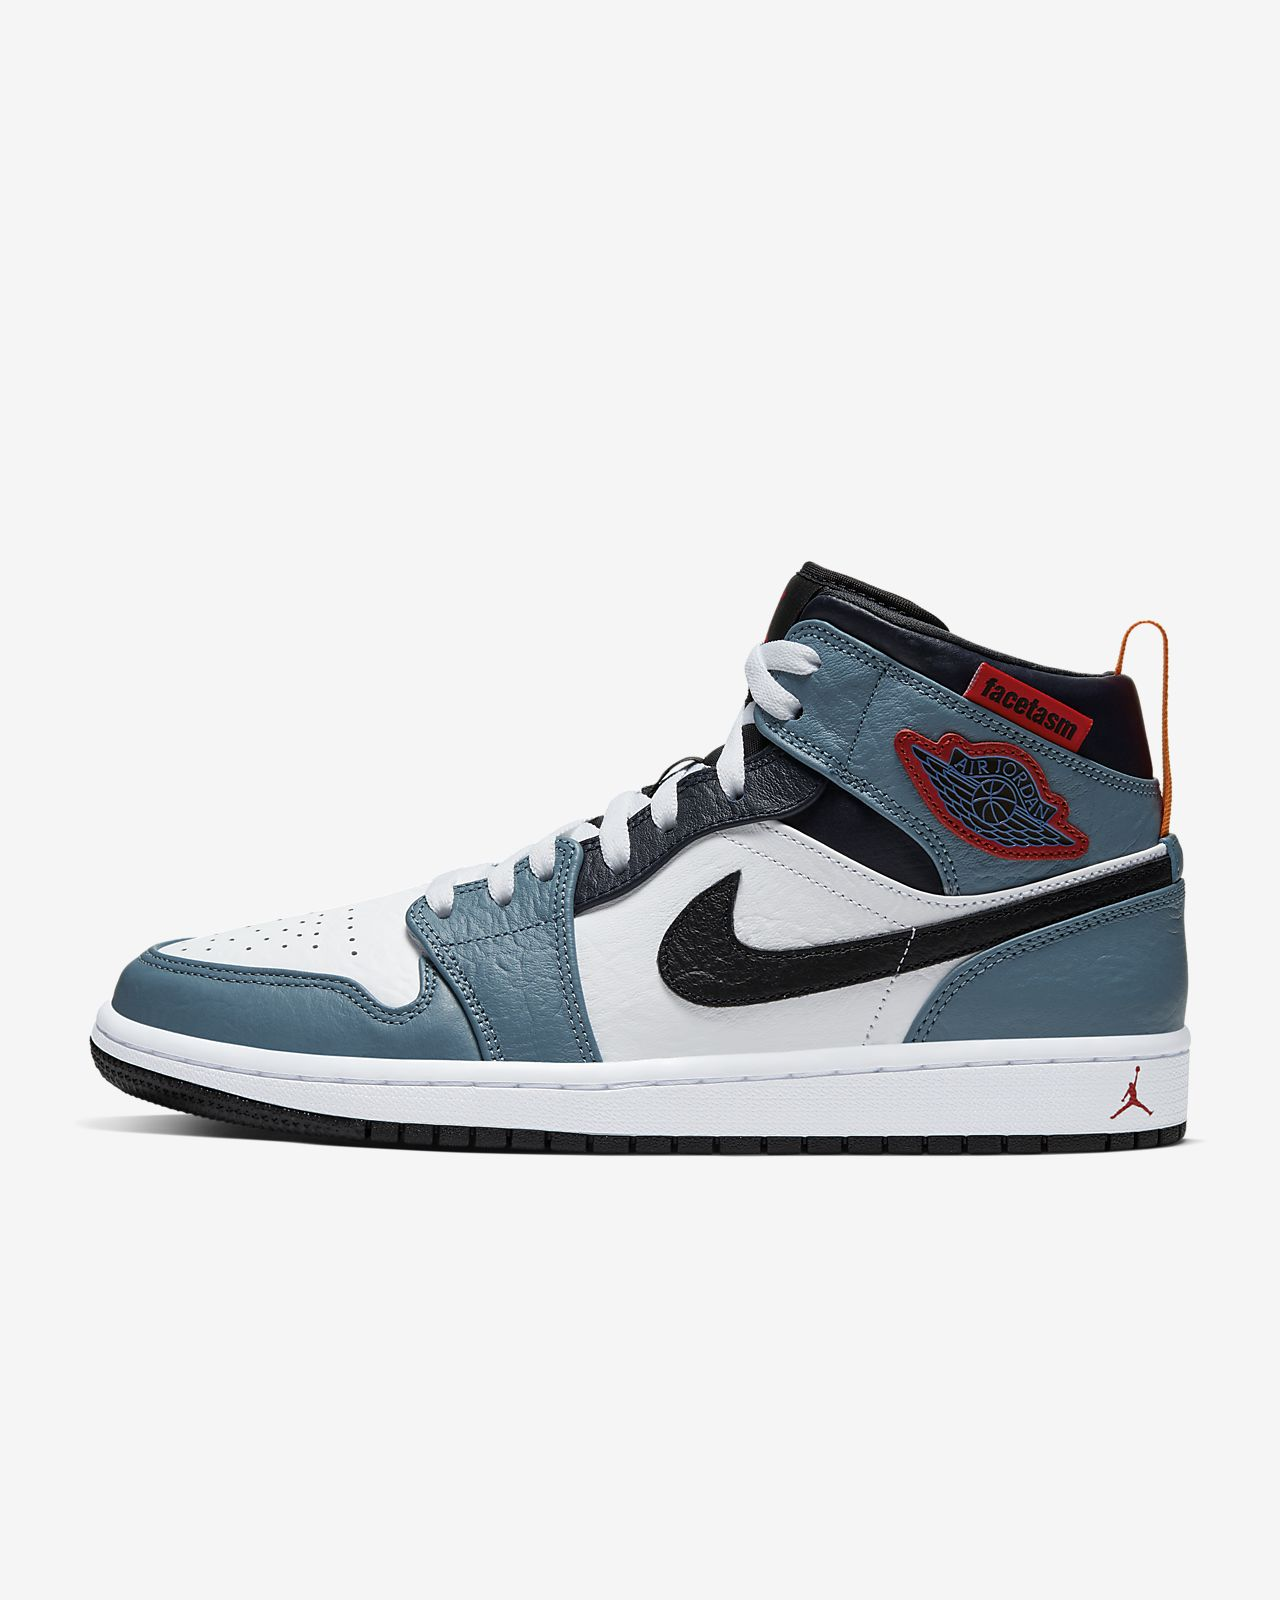 Air Jordan 1 Mid SE Fearless Shoe